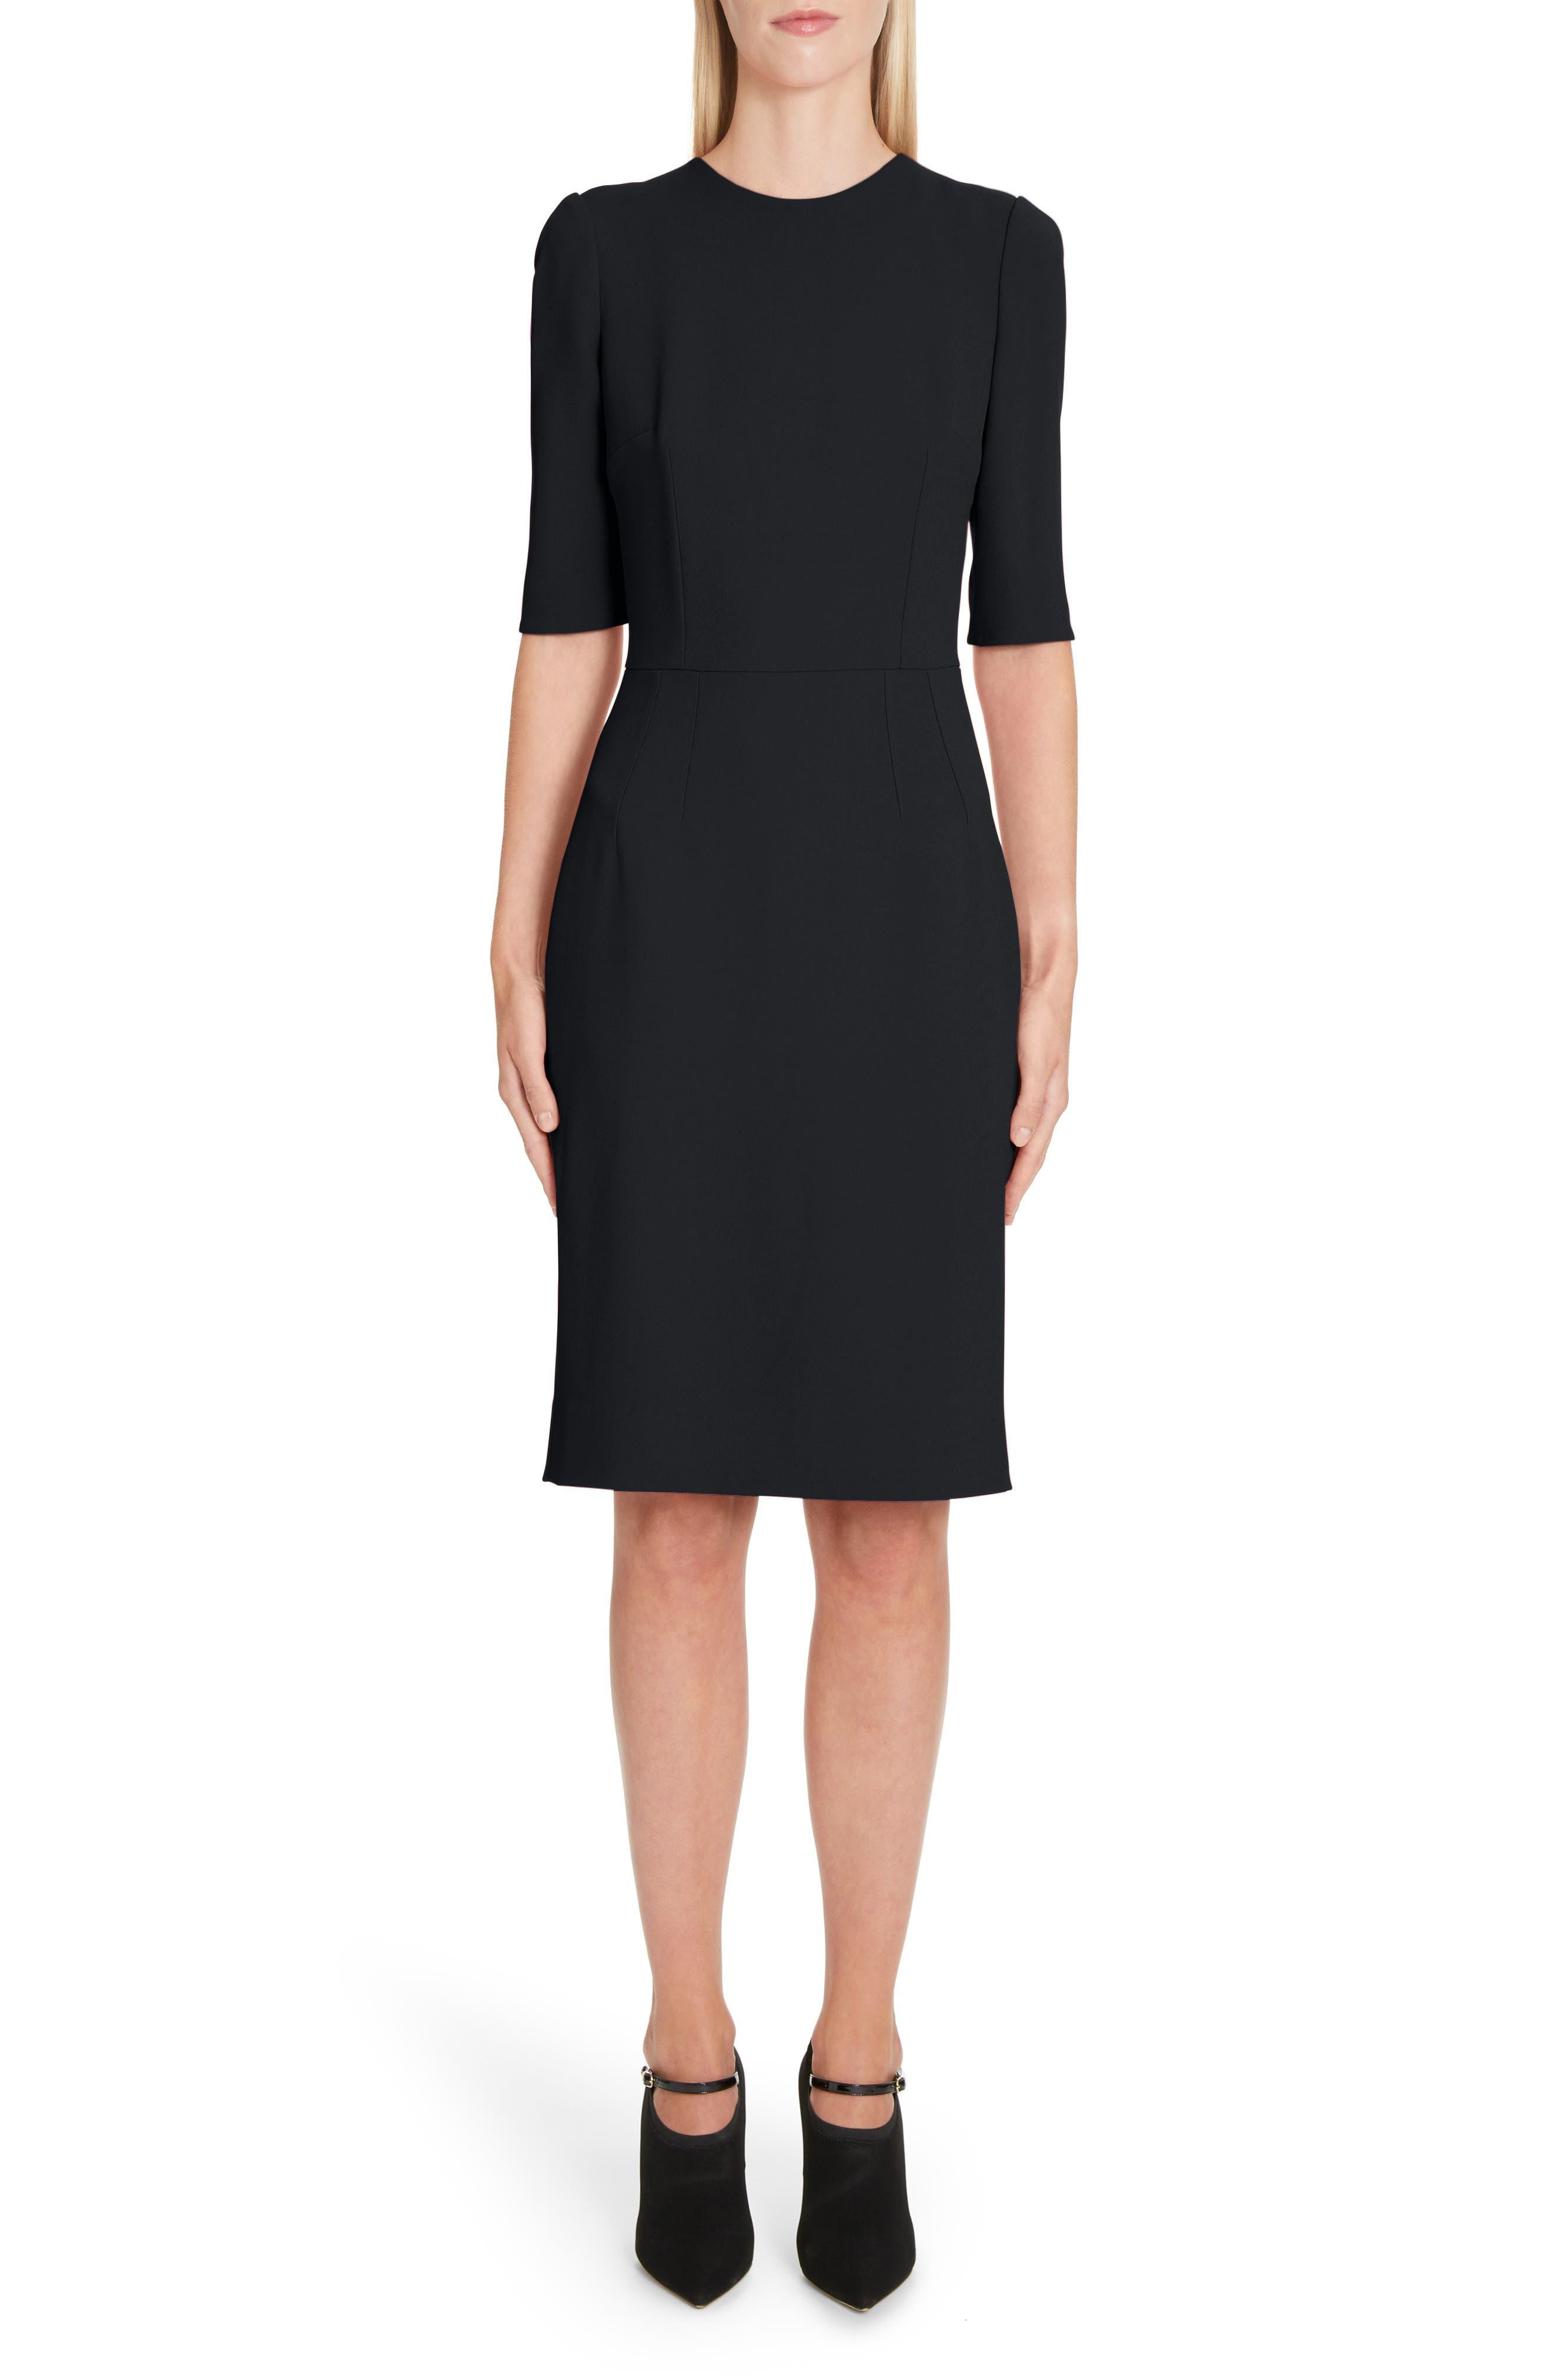 Dolce & gabbana Cady Sheath Dress, 8 IT - Black